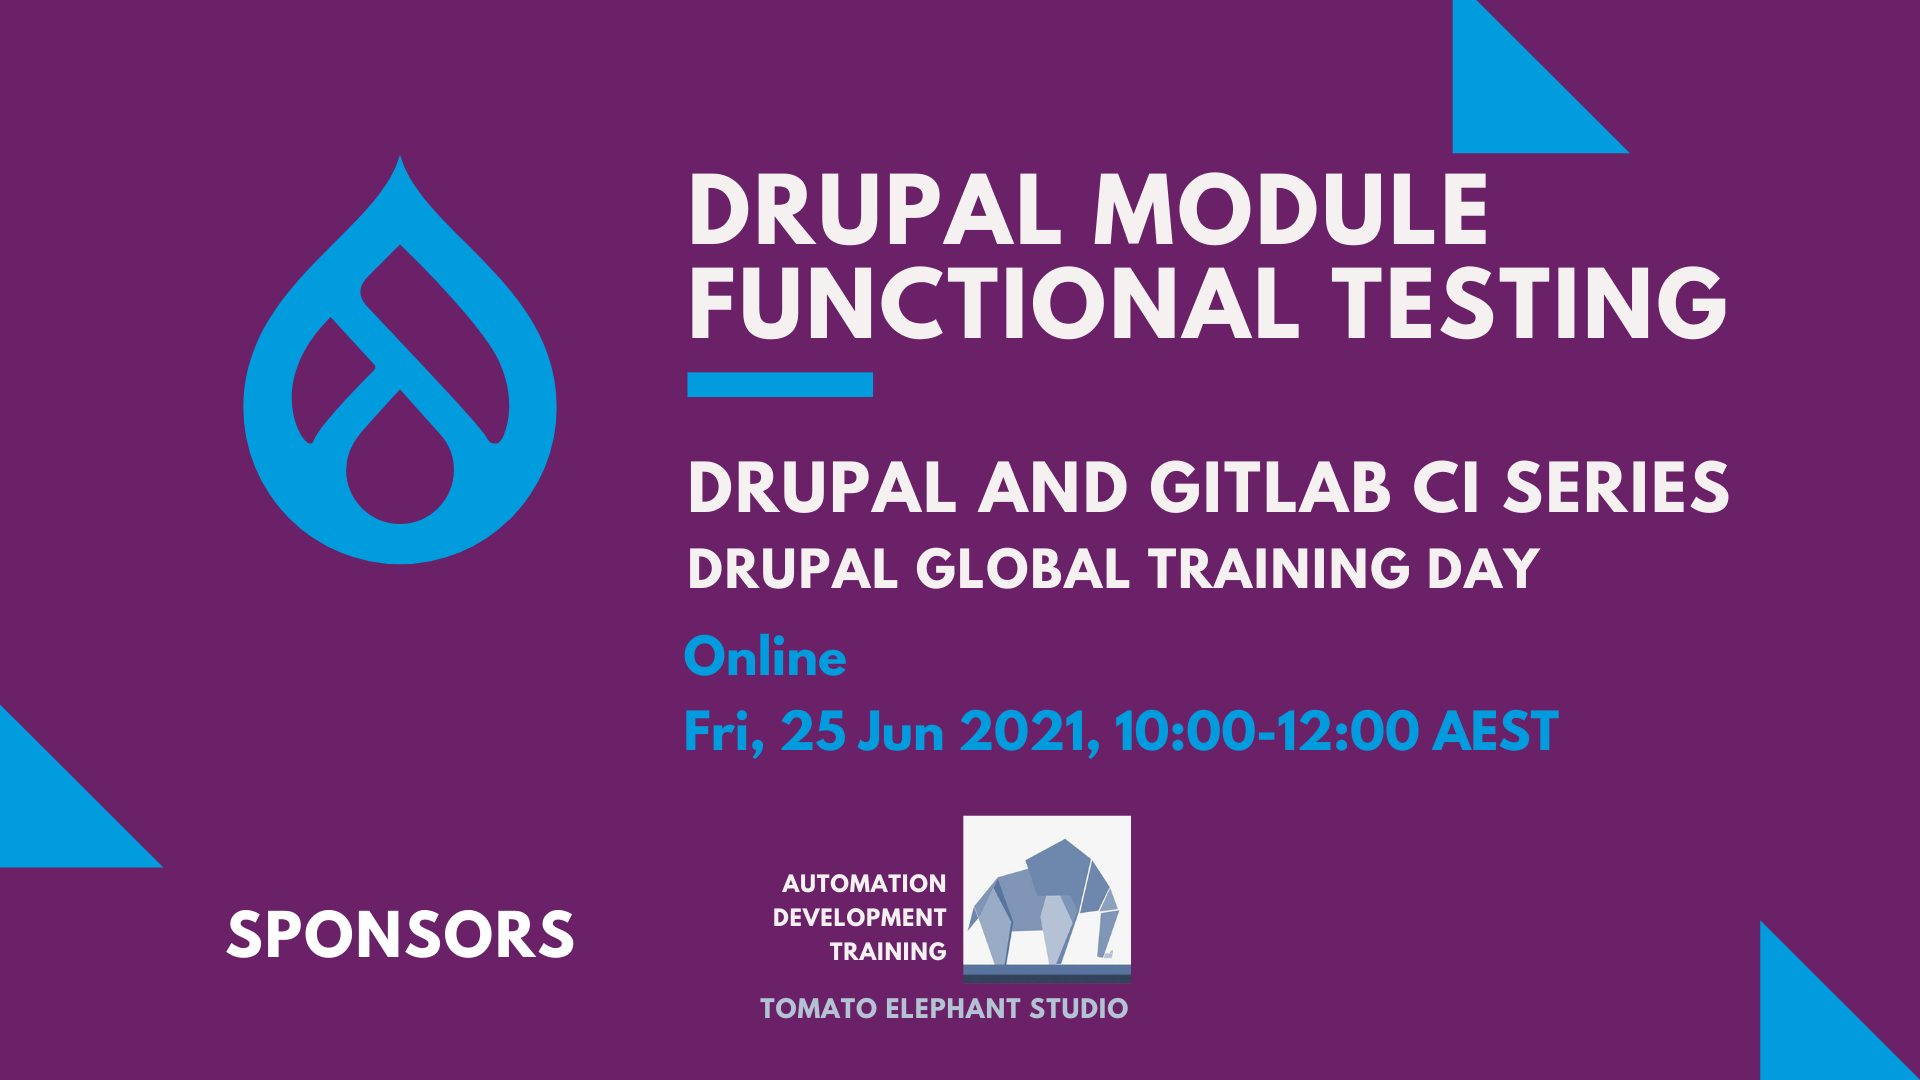 Training: Drupal module quality assurance (Drupal and Gitlab CI series)